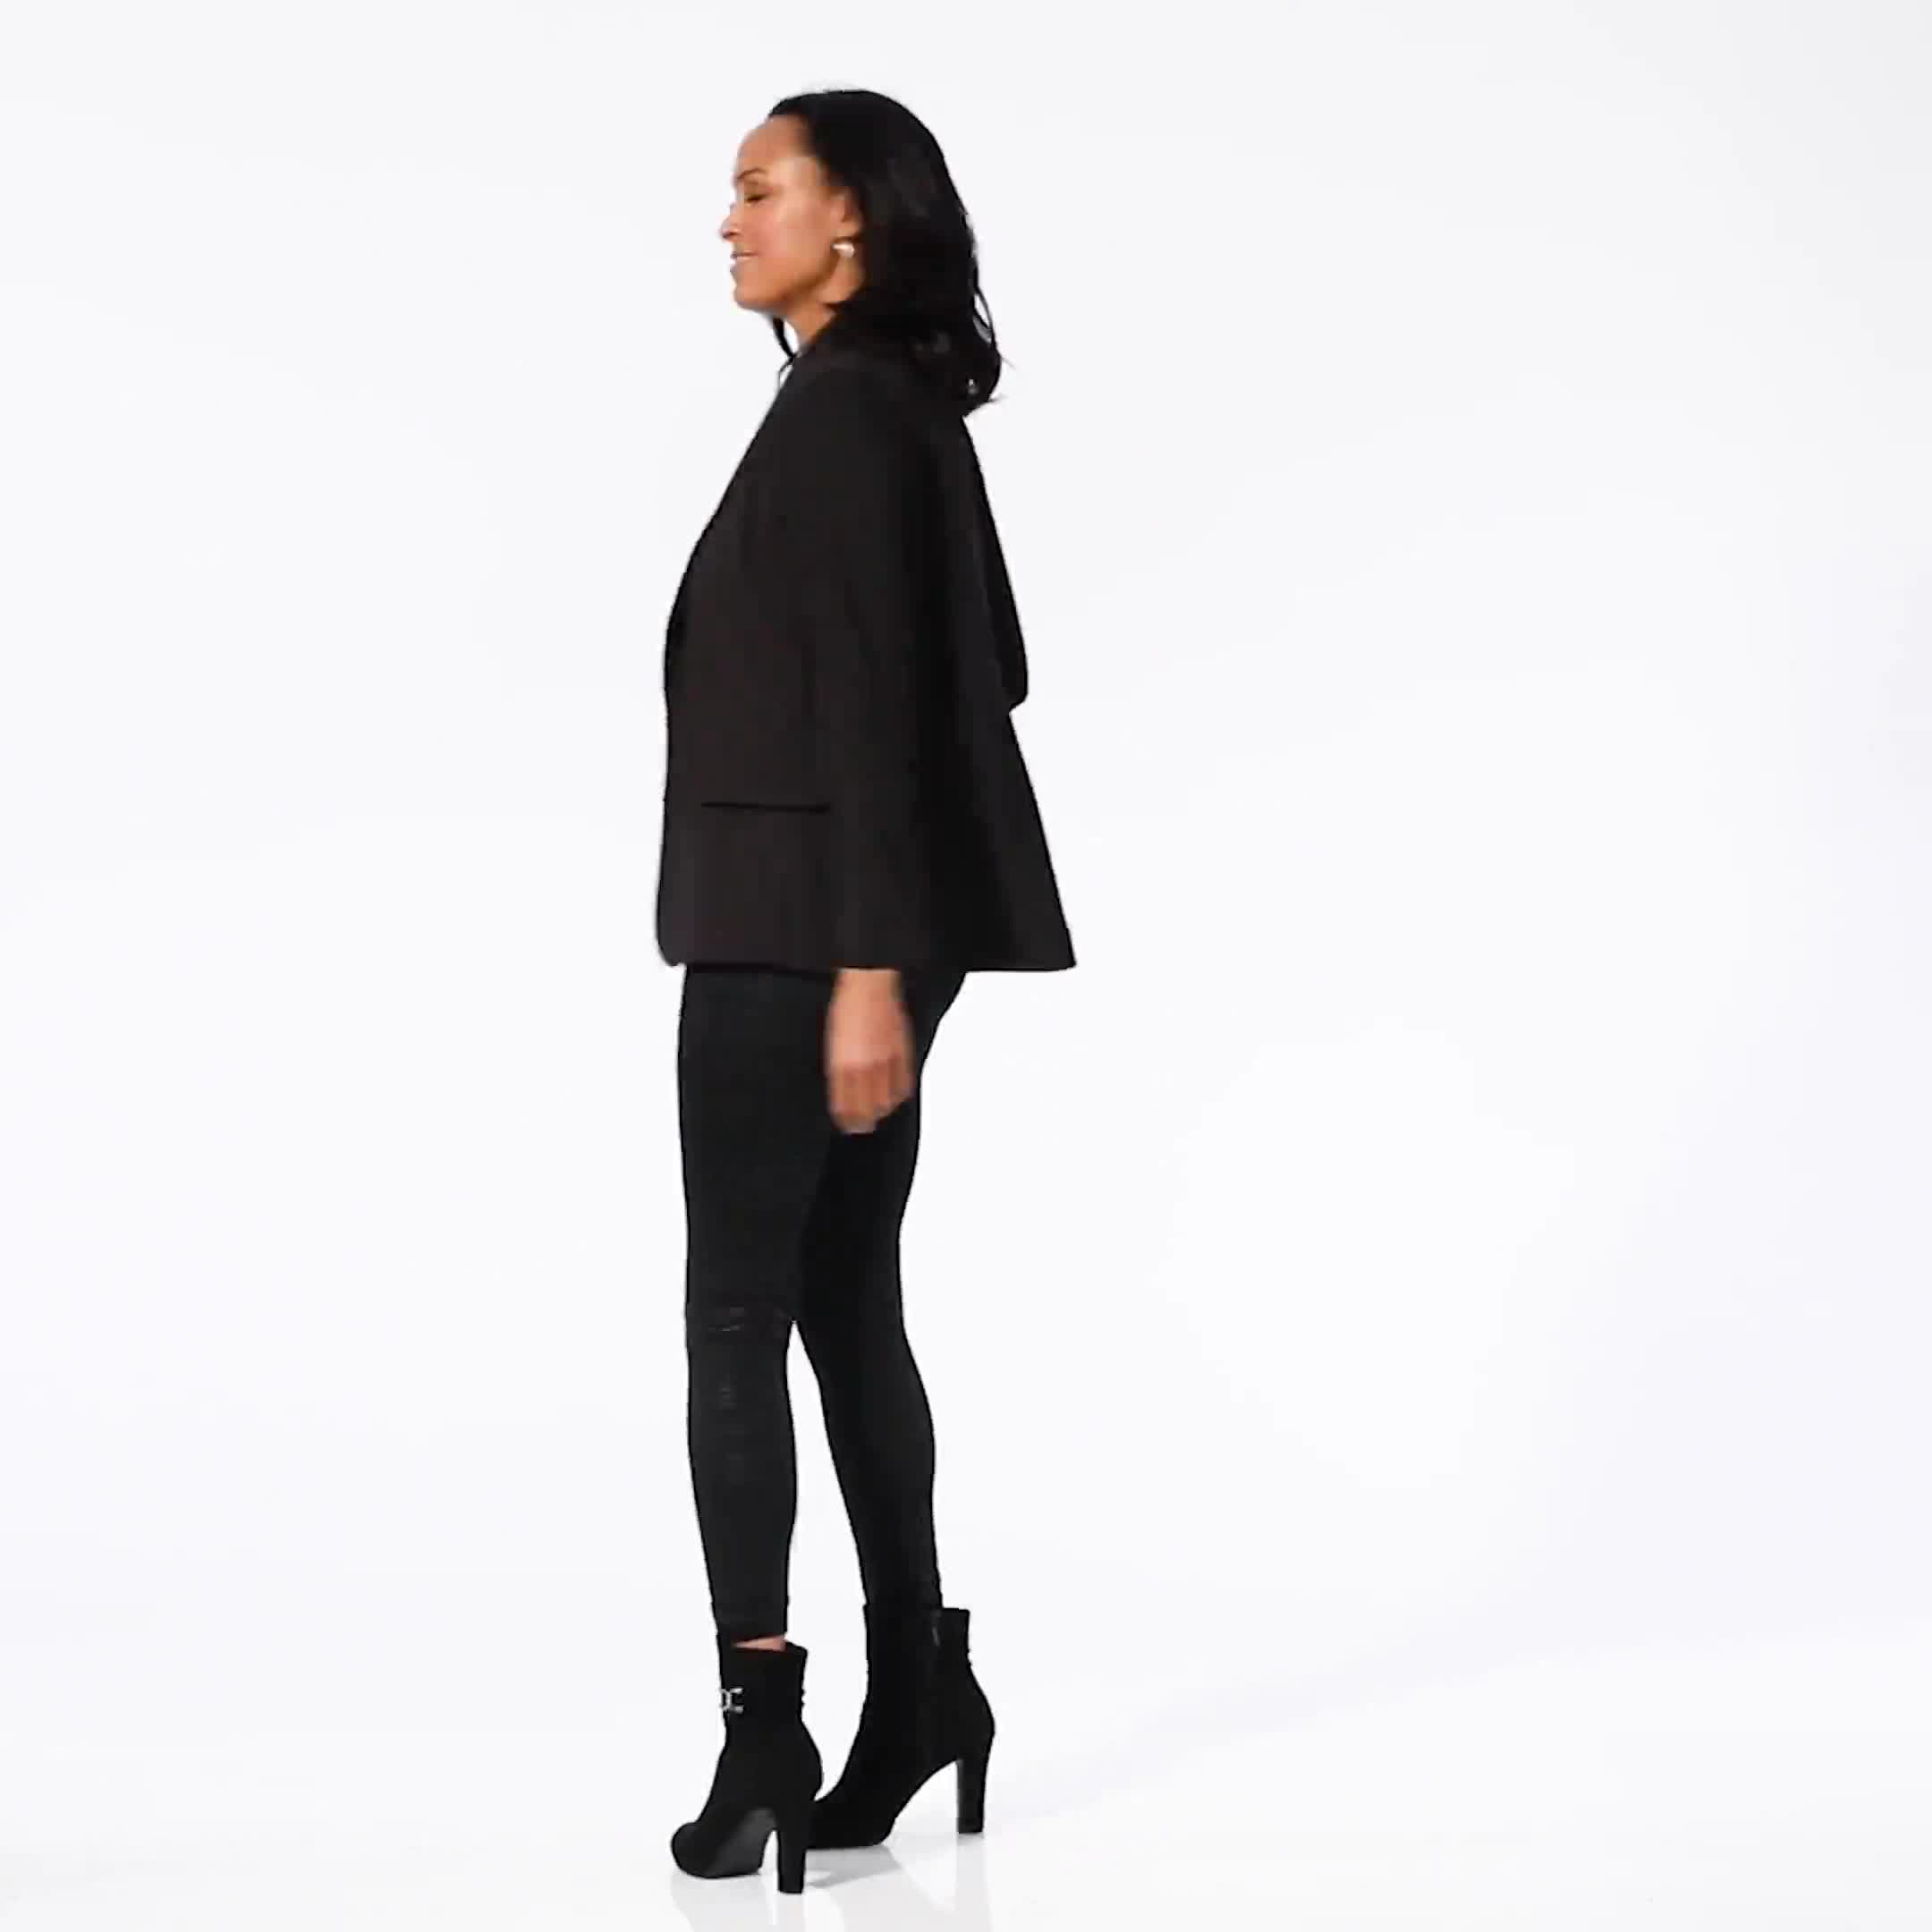 Elo Sportswear Black Plaid Legging - Video